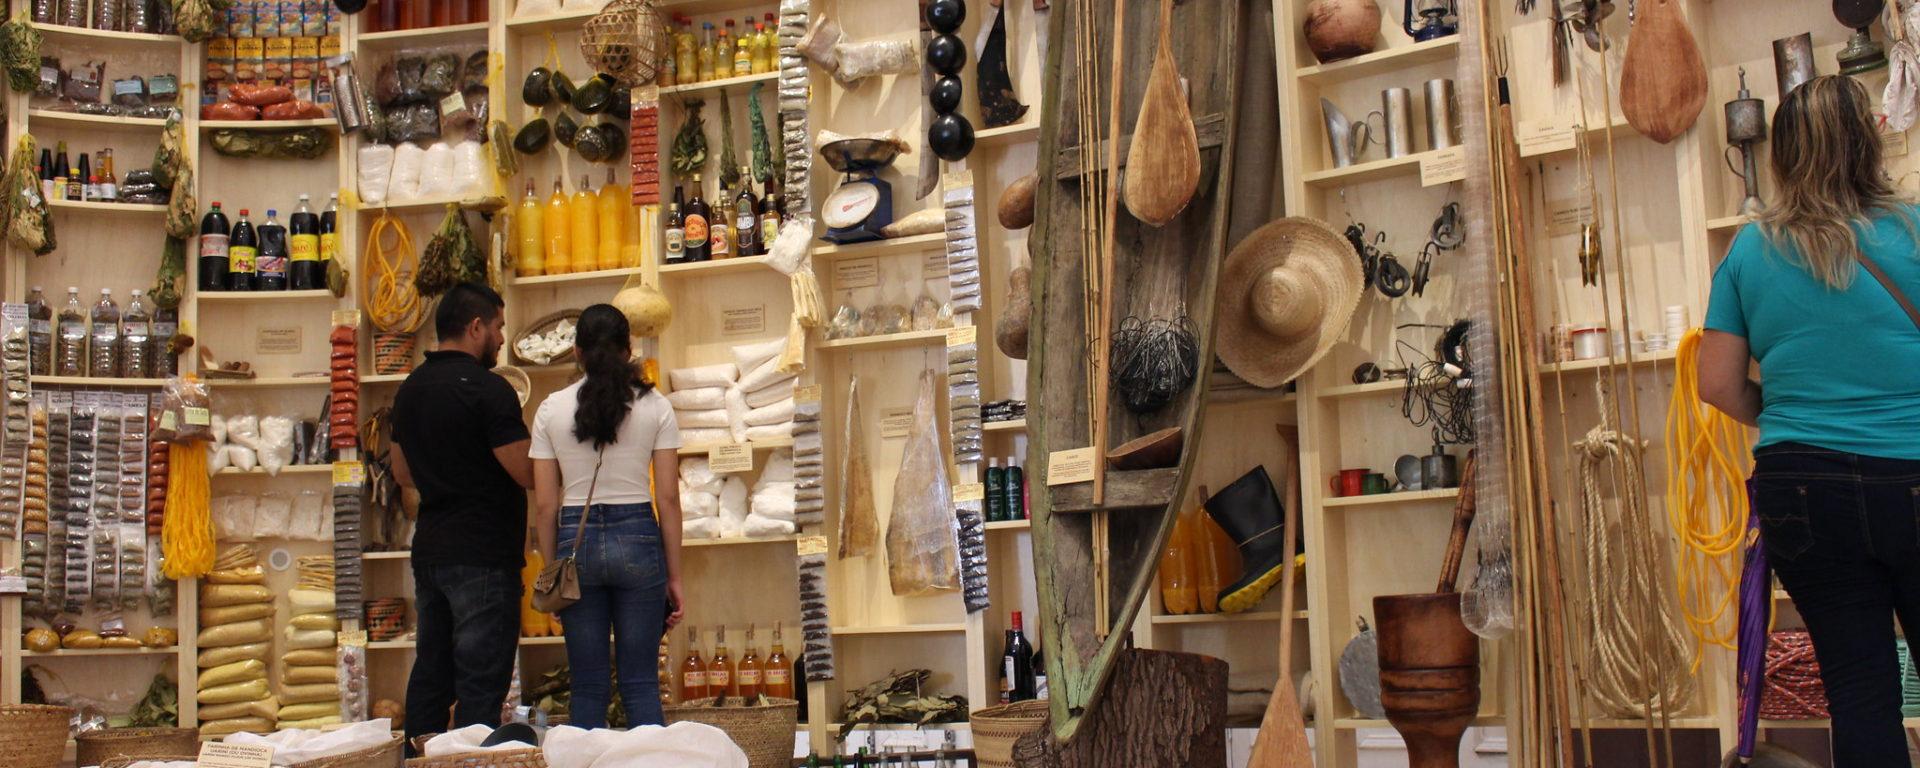 Museu da Cidade de Manaus, Fotos David Batista